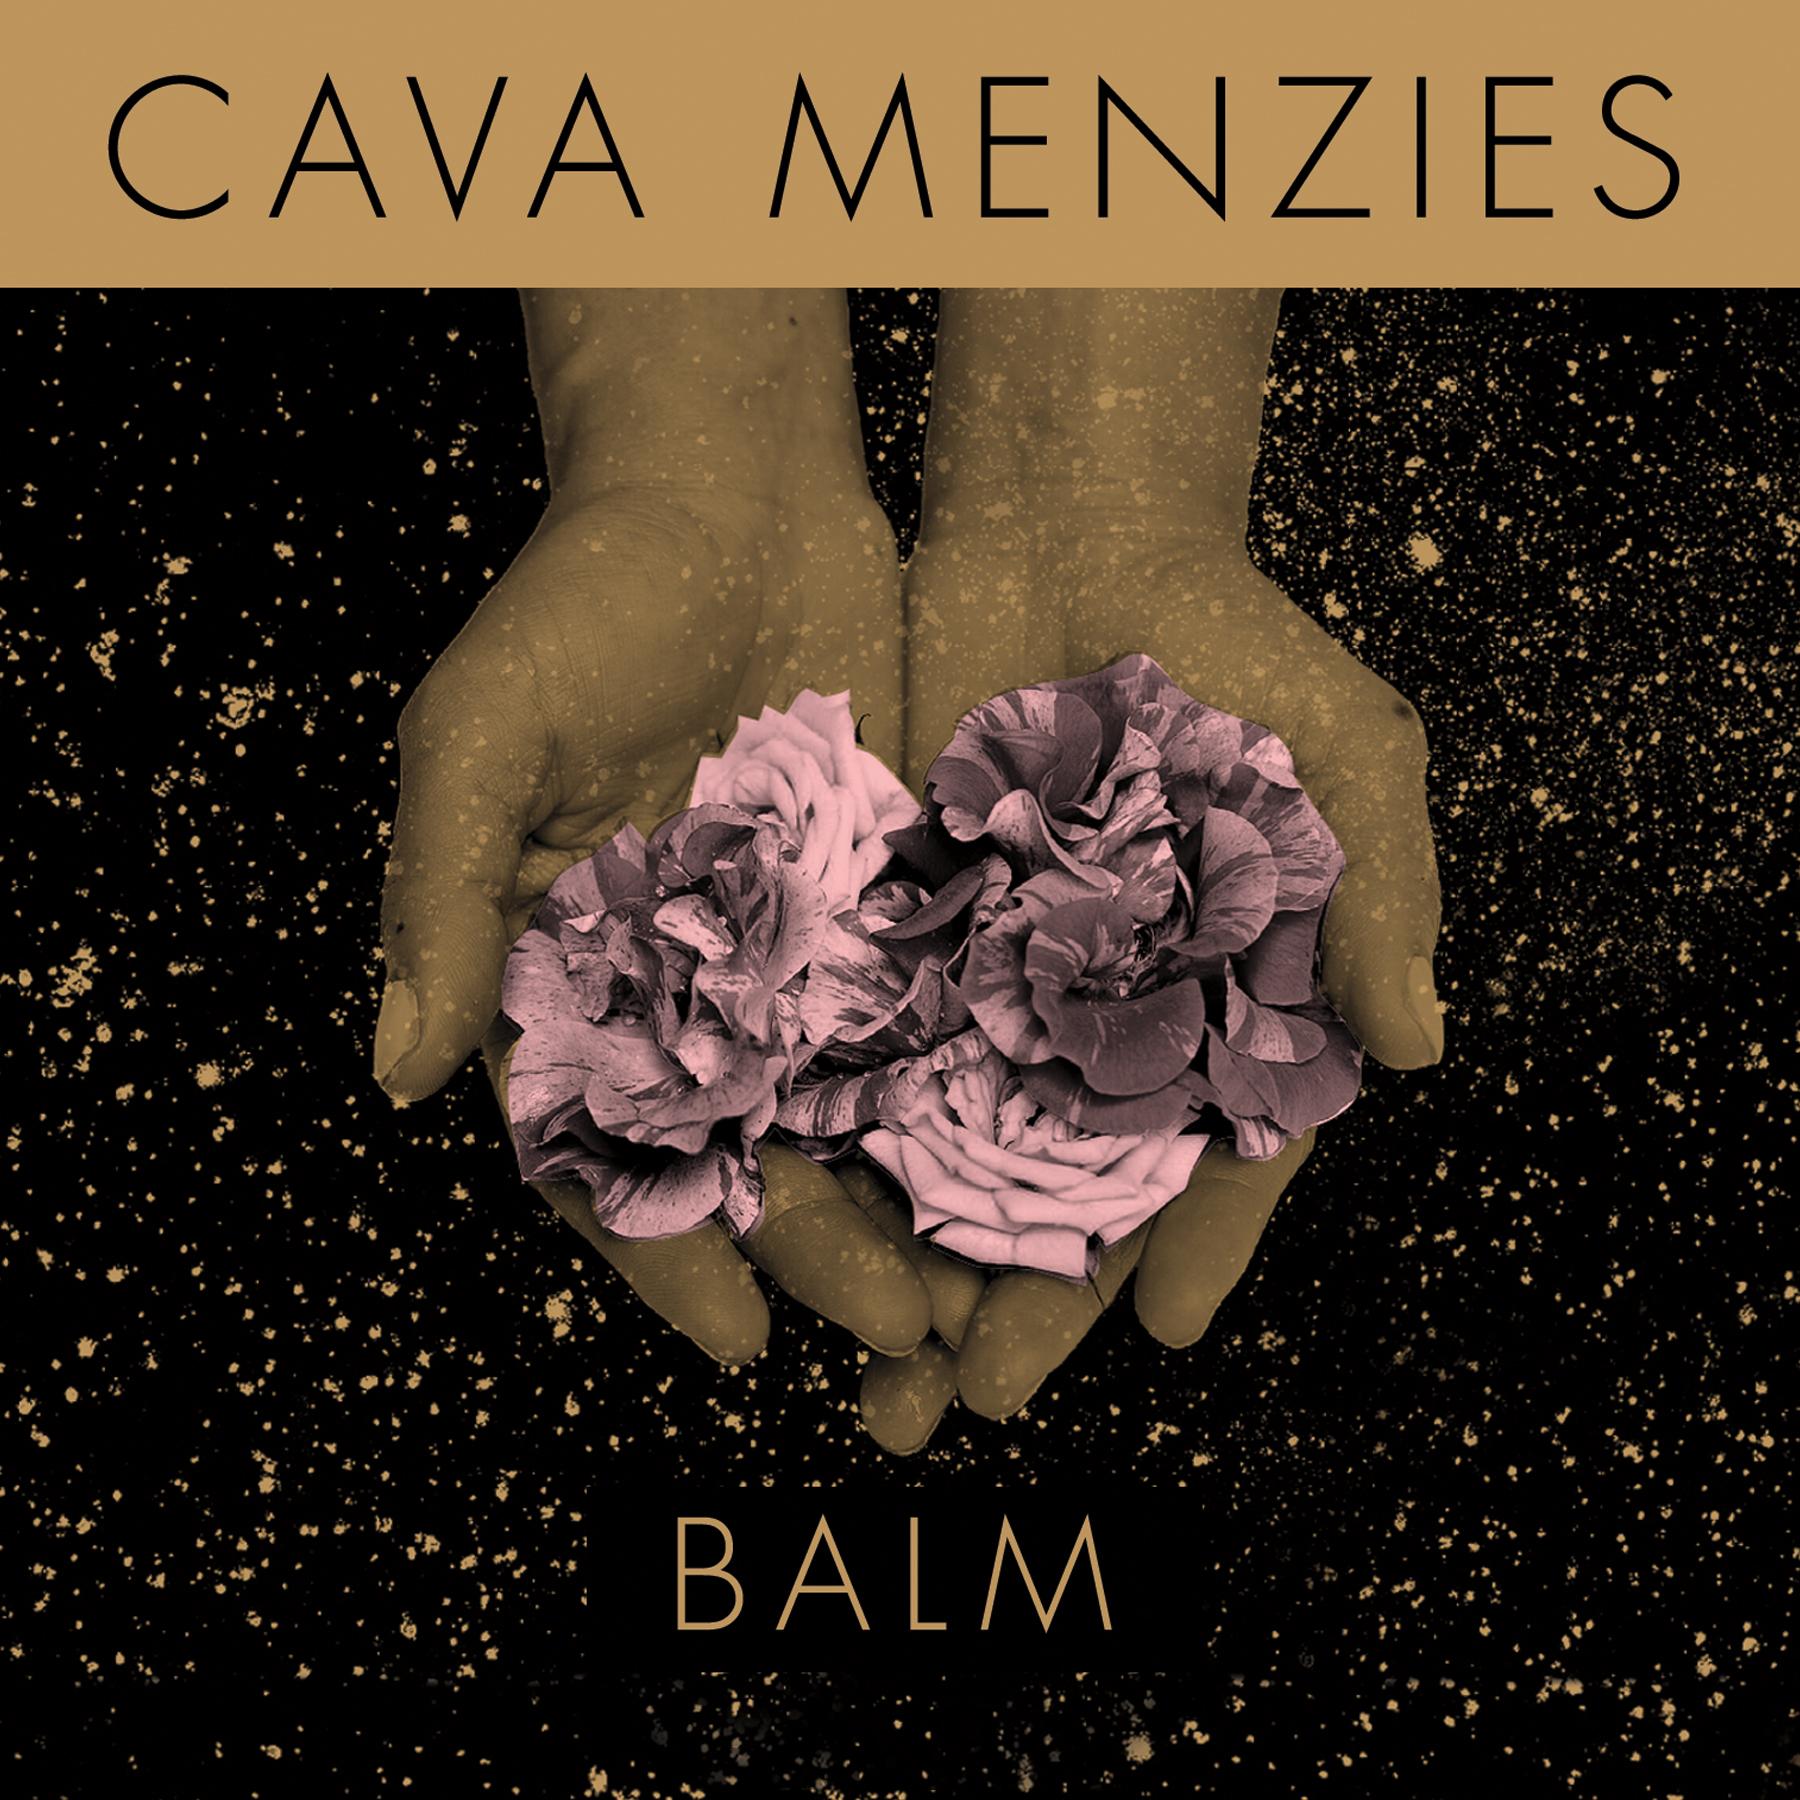 Cava Menzies - Balm (EP)